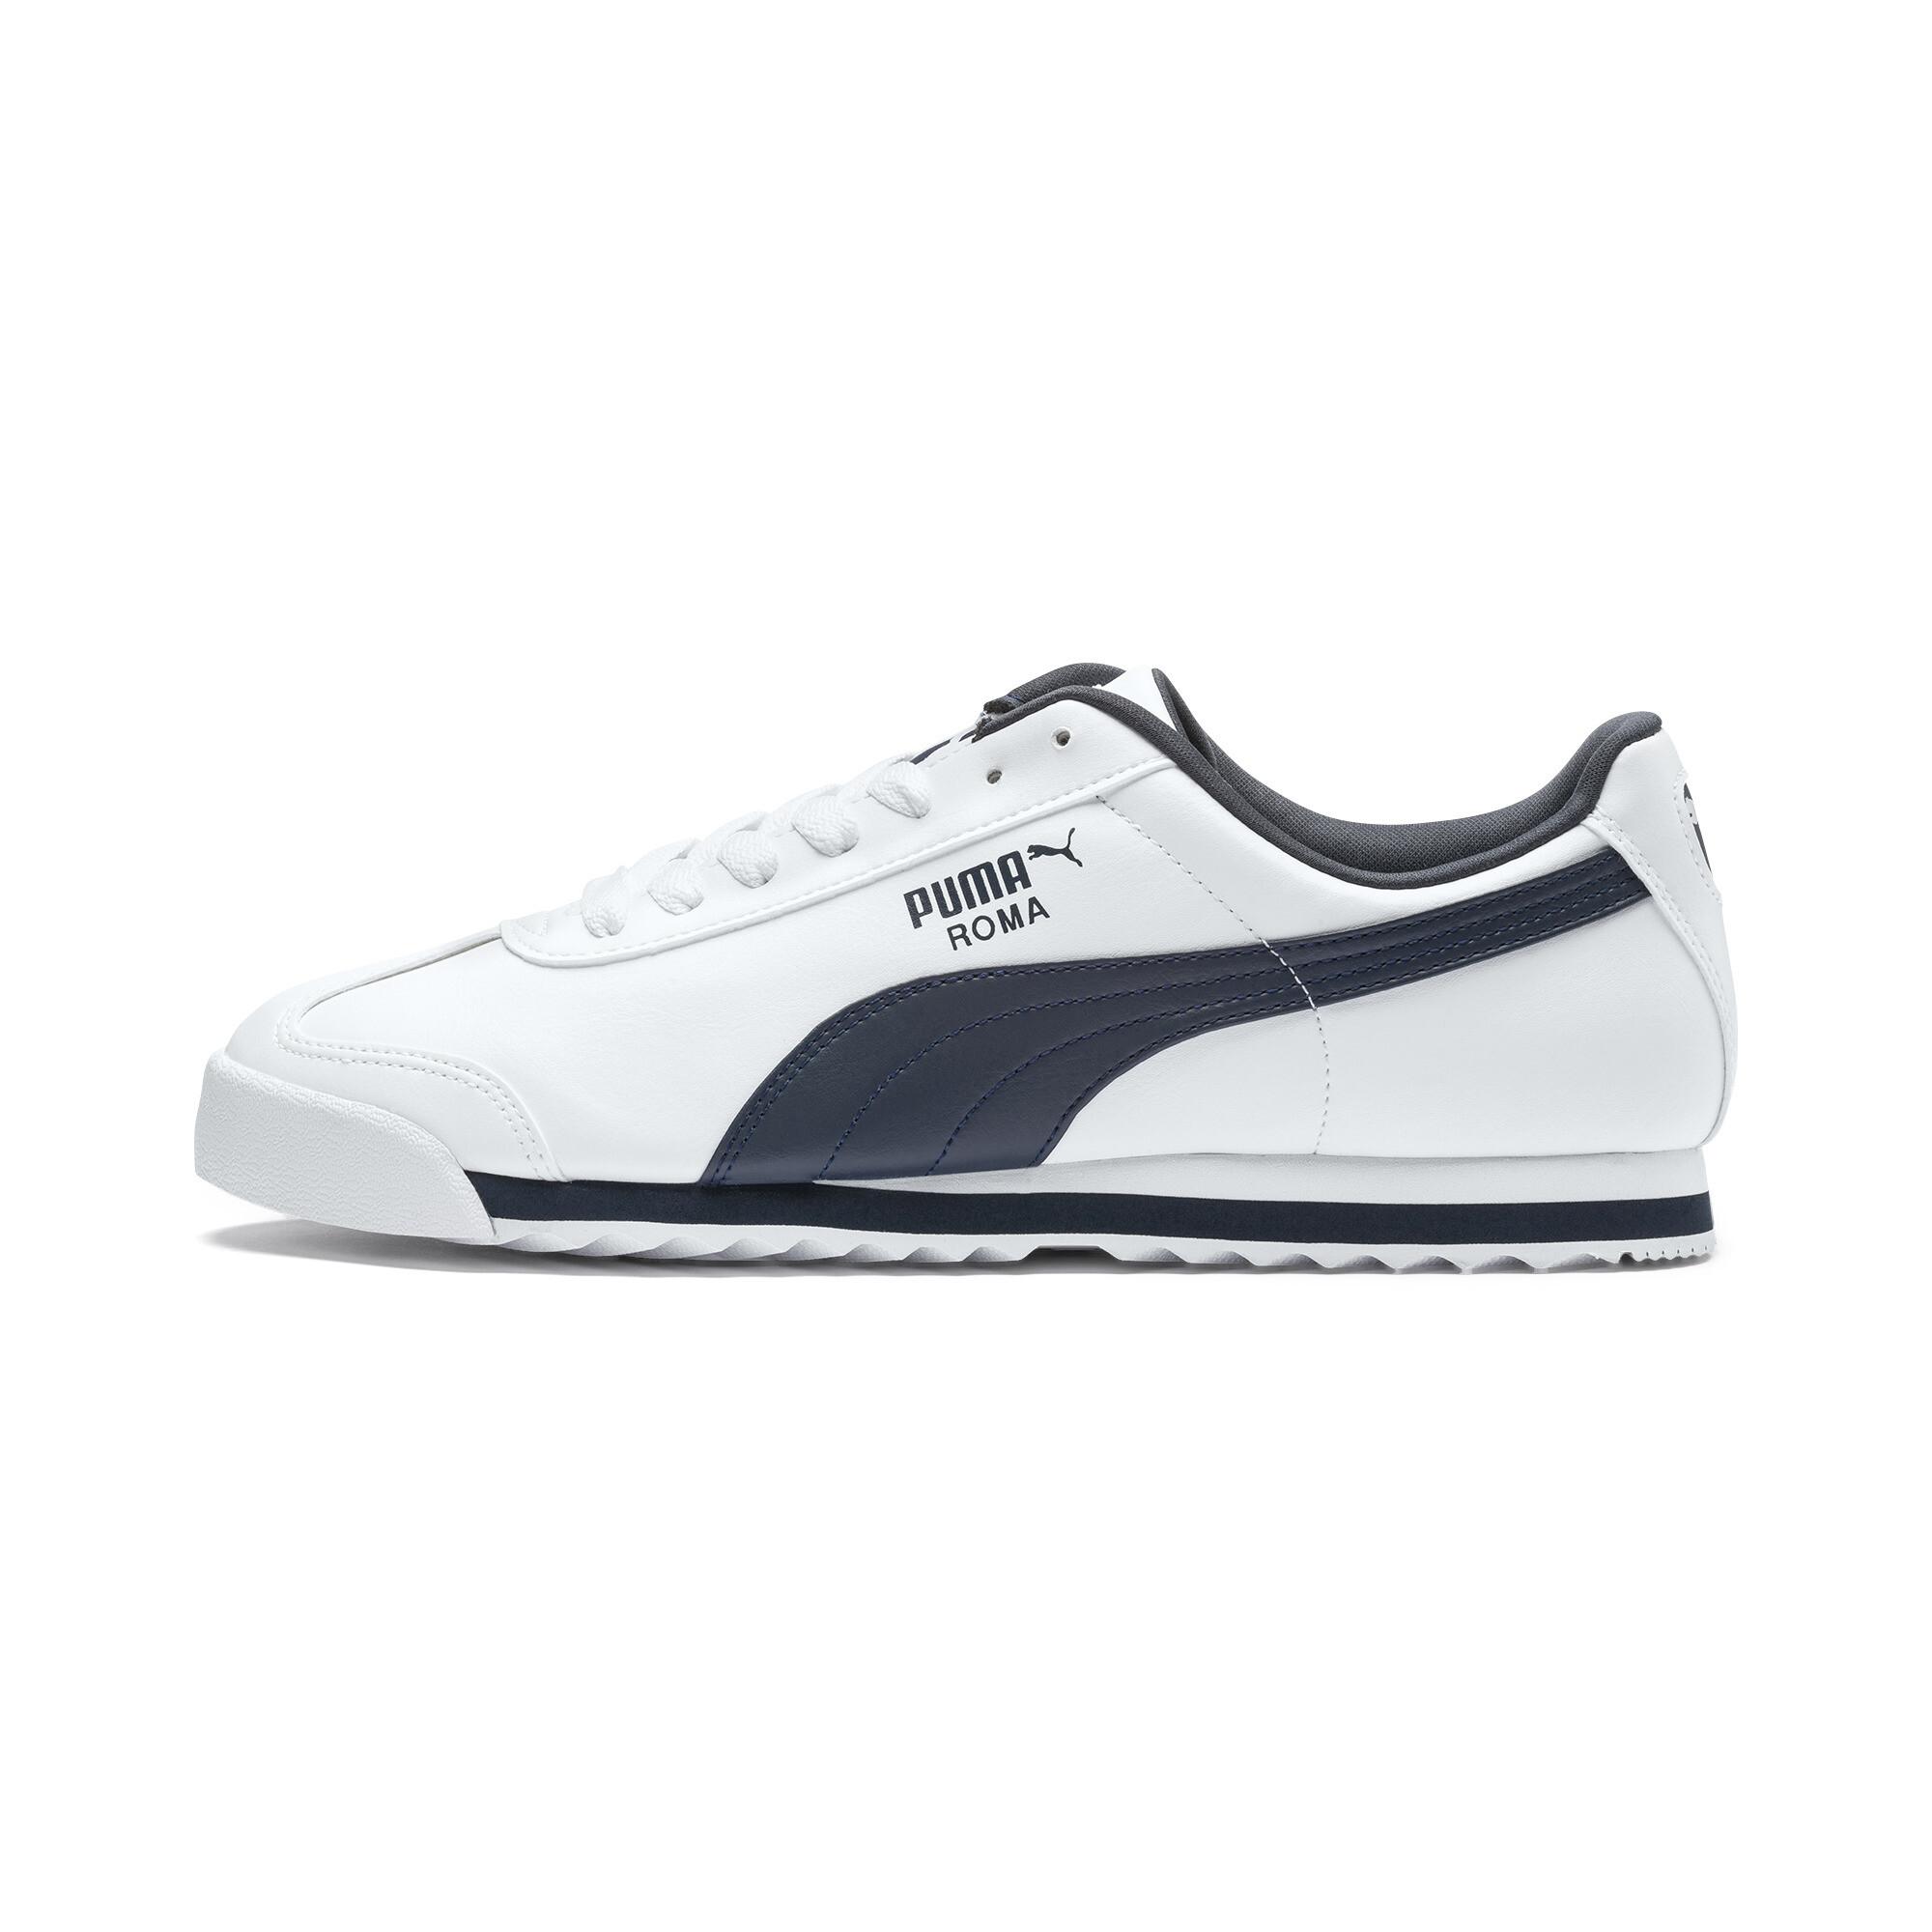 miniature 18 - Puma Men's Roma Basic Sneakers